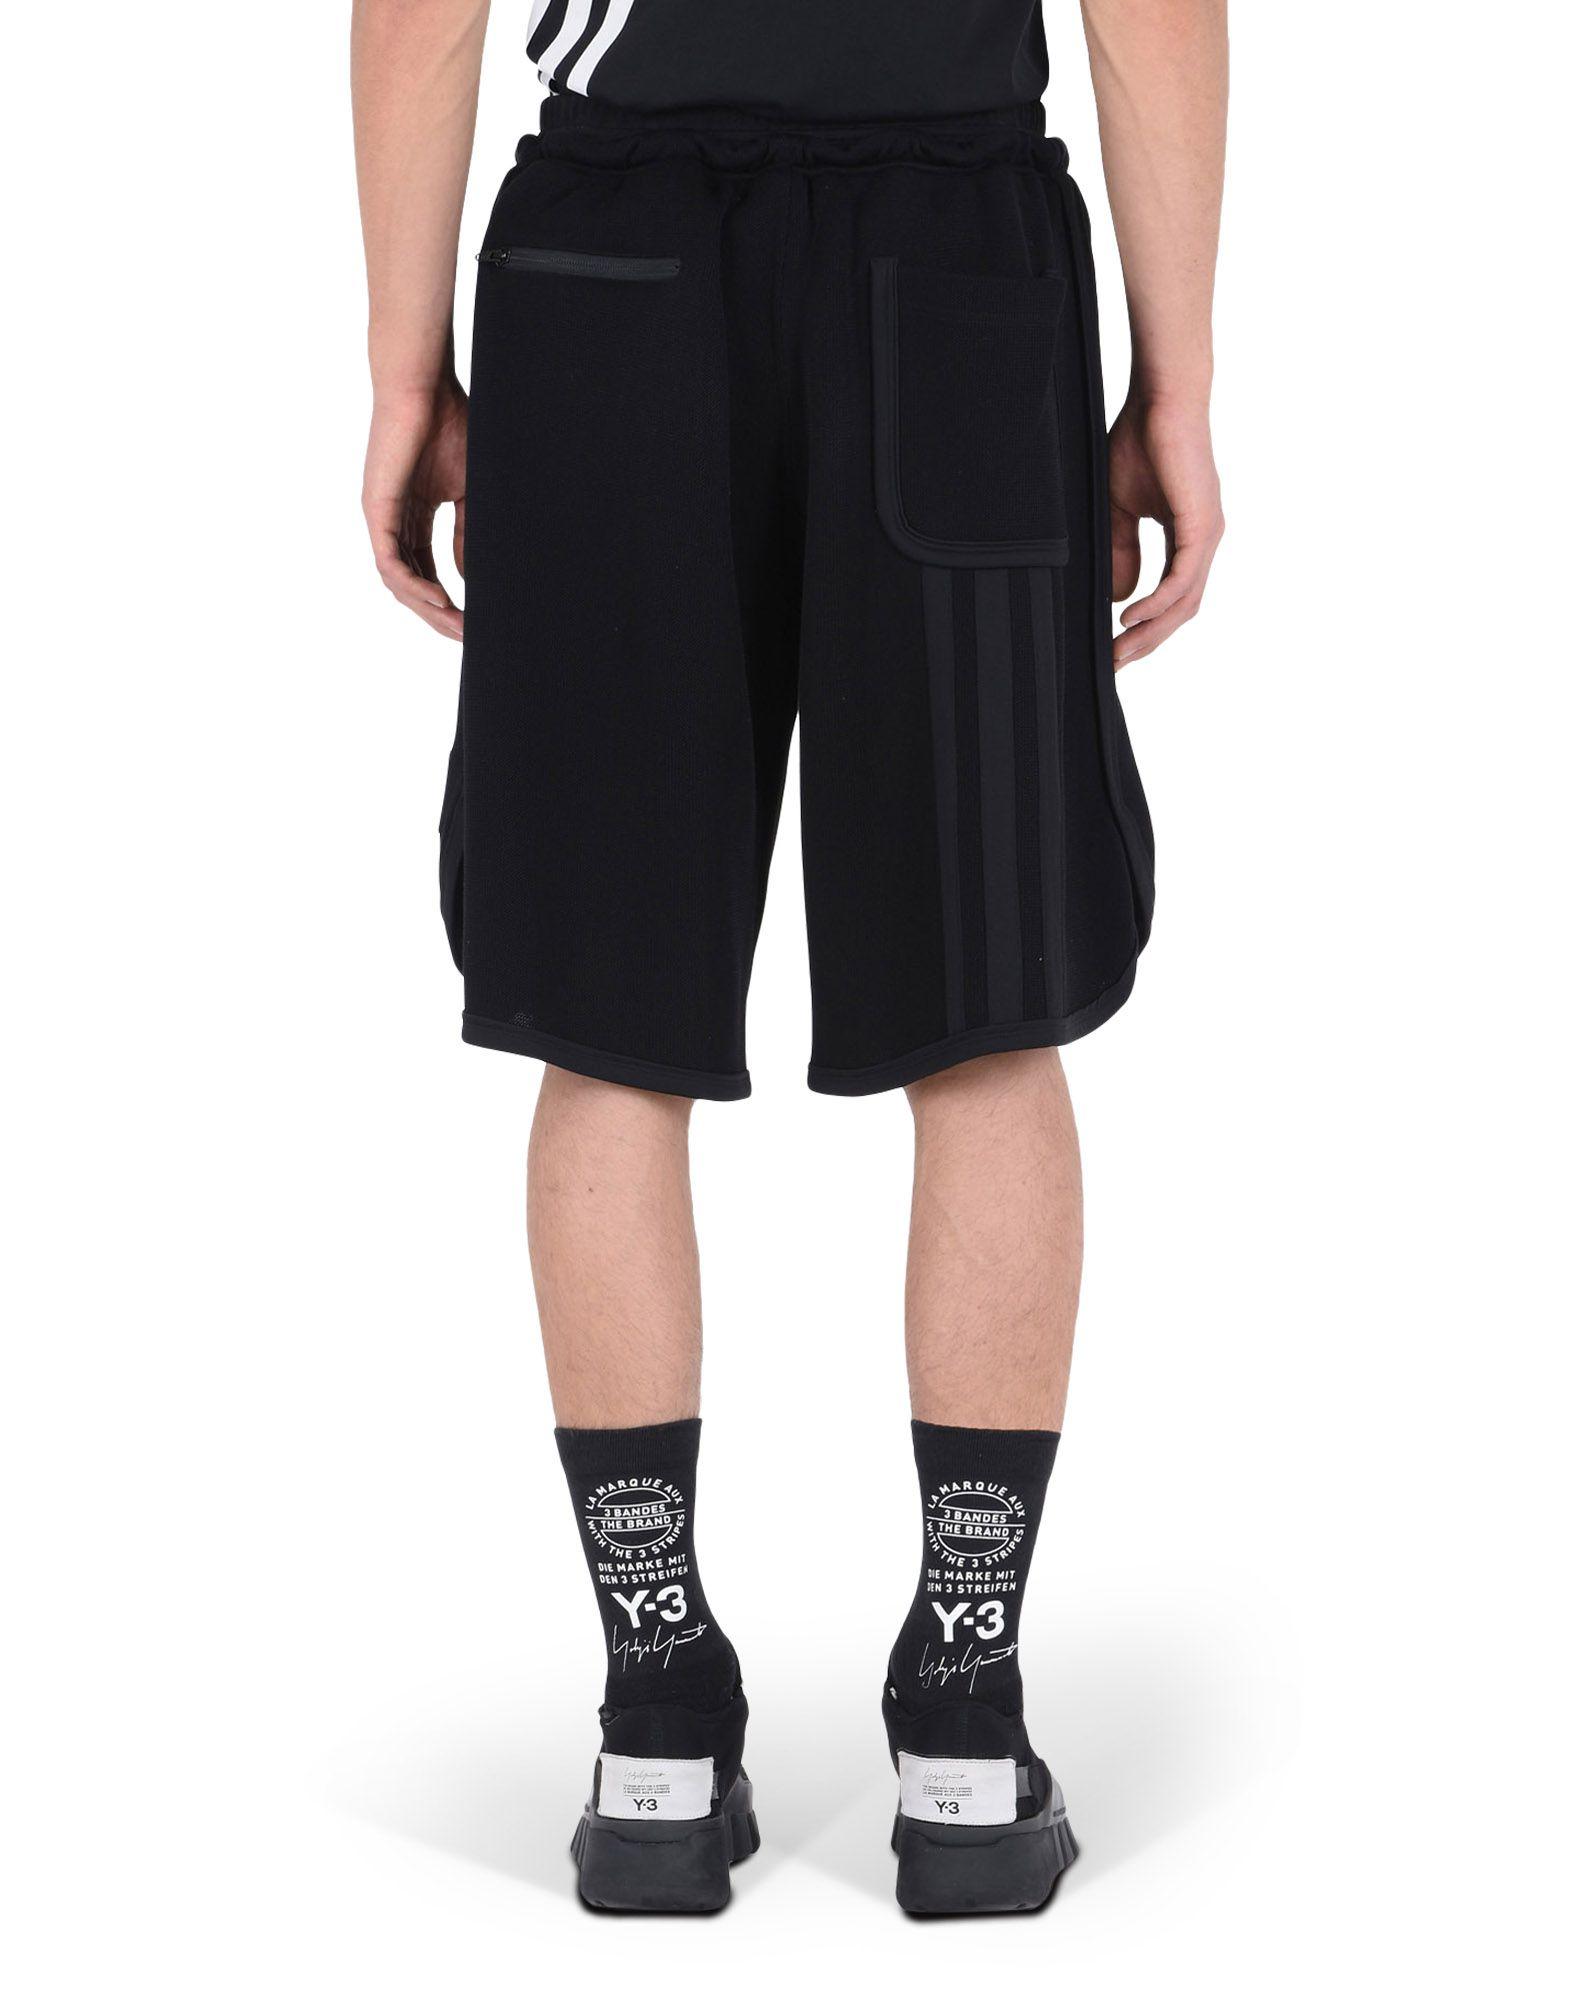 Y-3 Y-3 MESH 3-STRIPES SHORTS Shorts Man e